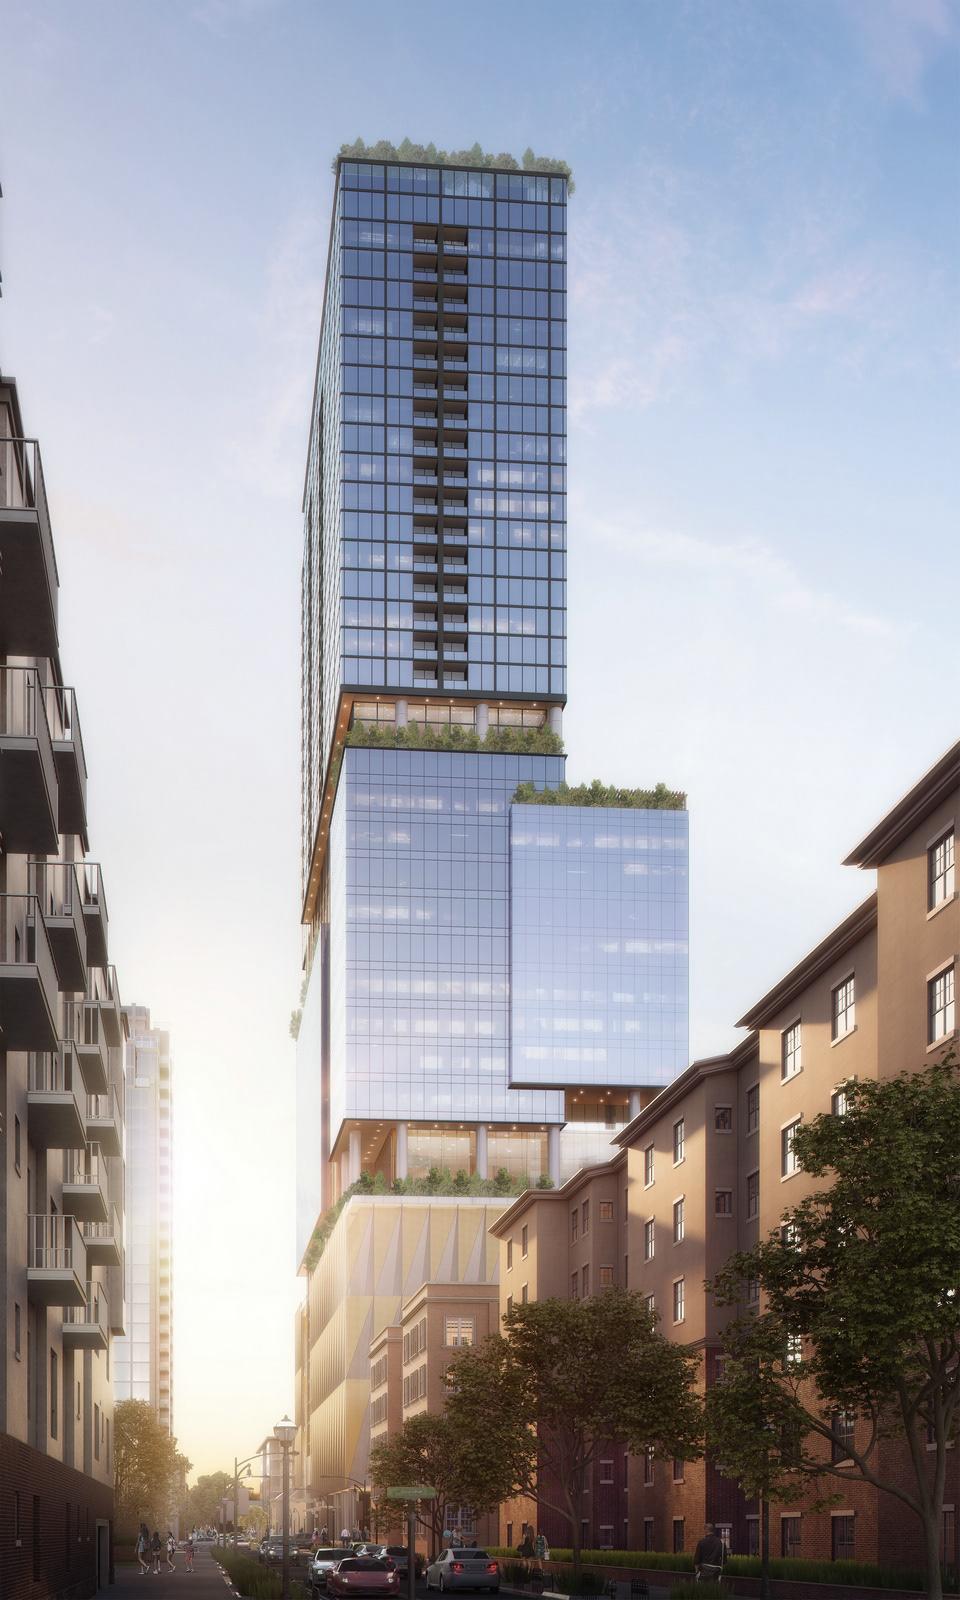 Exterior rendering Tower Rendering visualization